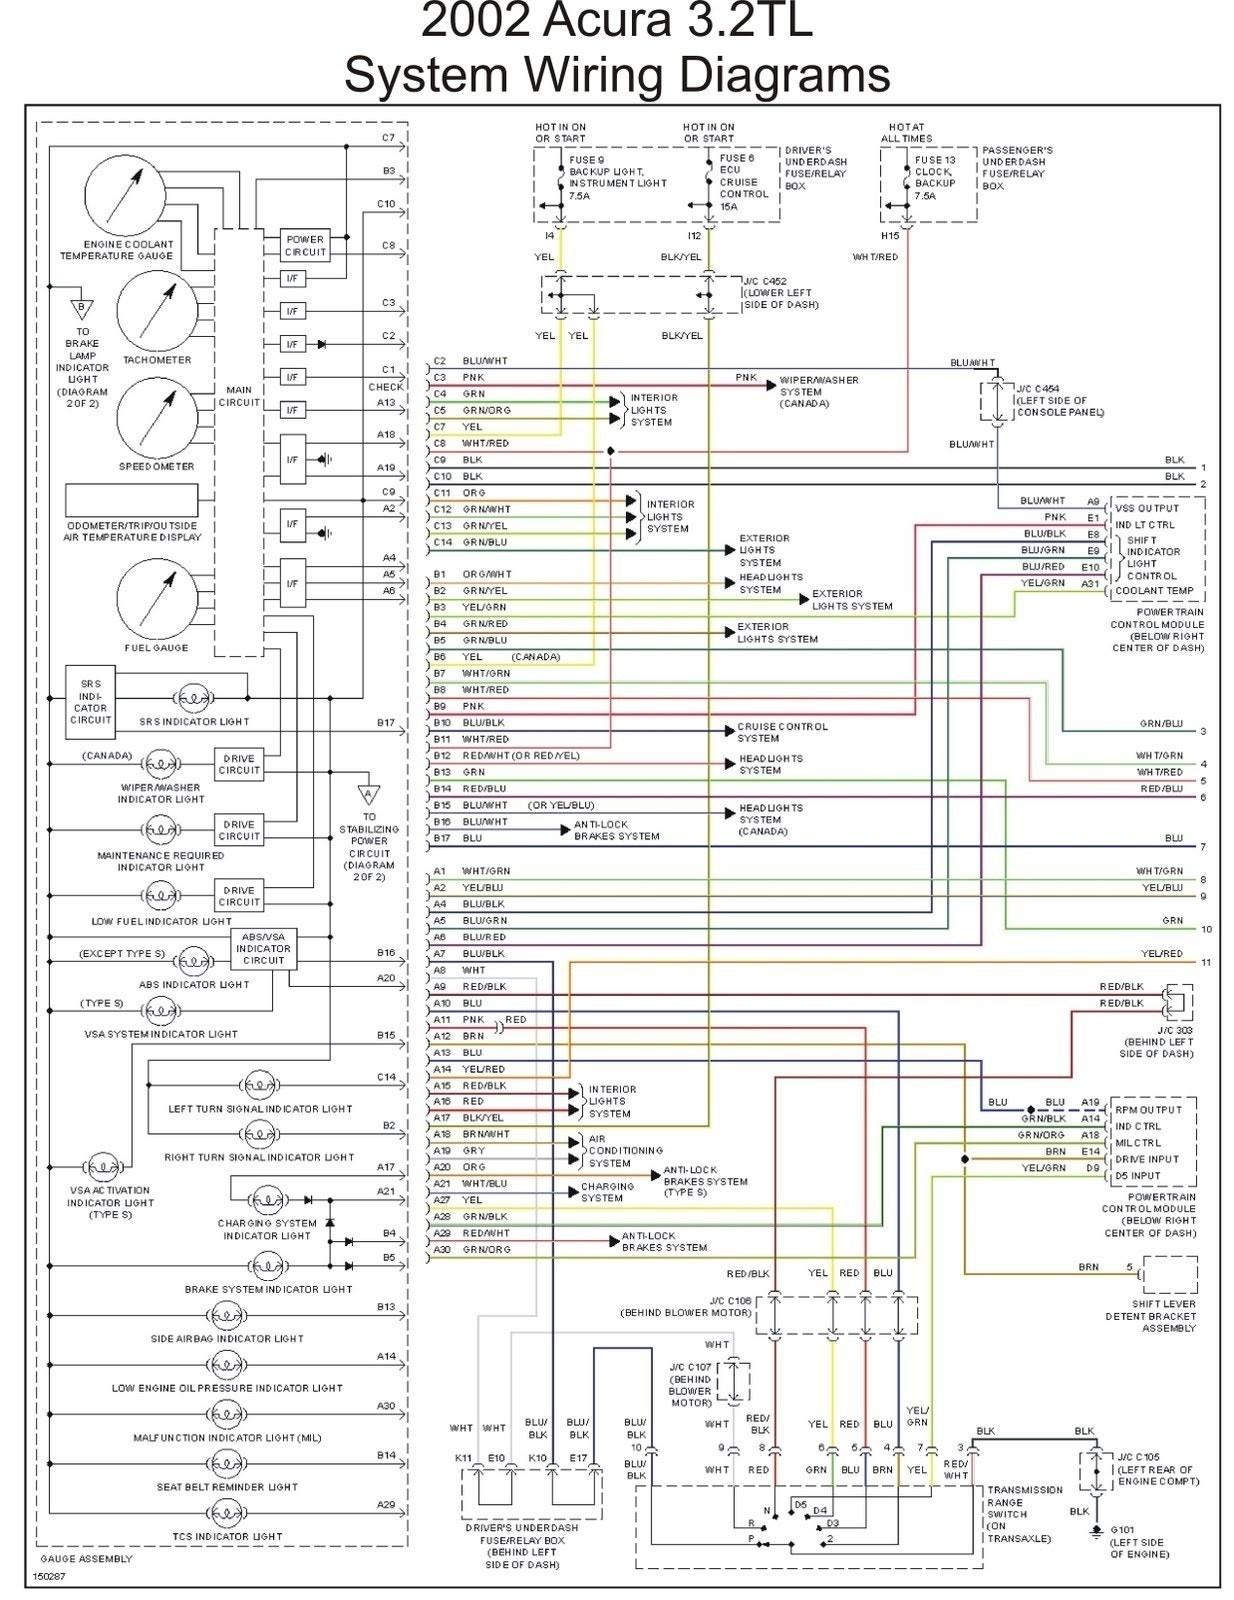 2000 Honda Civic Engine Diagram Diagram Honda Civic Engine 2002 Honda Civic Engine Diagram Honda Of 2000 Honda Civic Engine Diagram